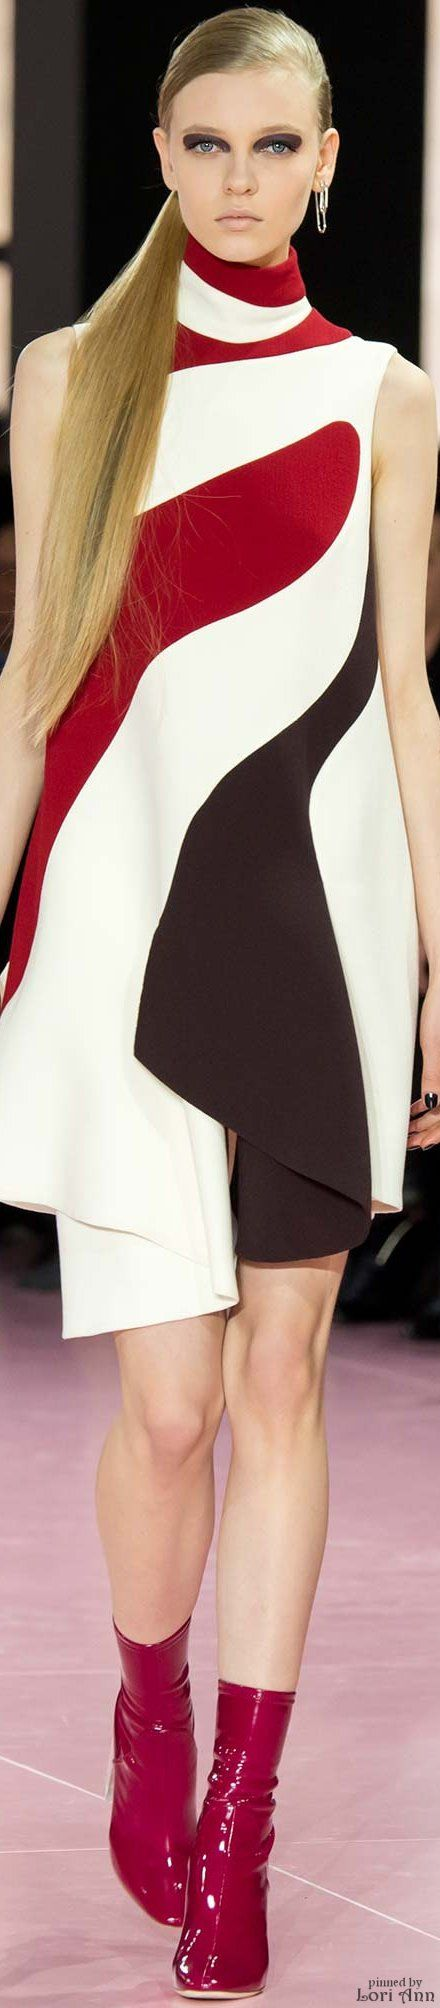 Christian Dior Fall 2015 RTW